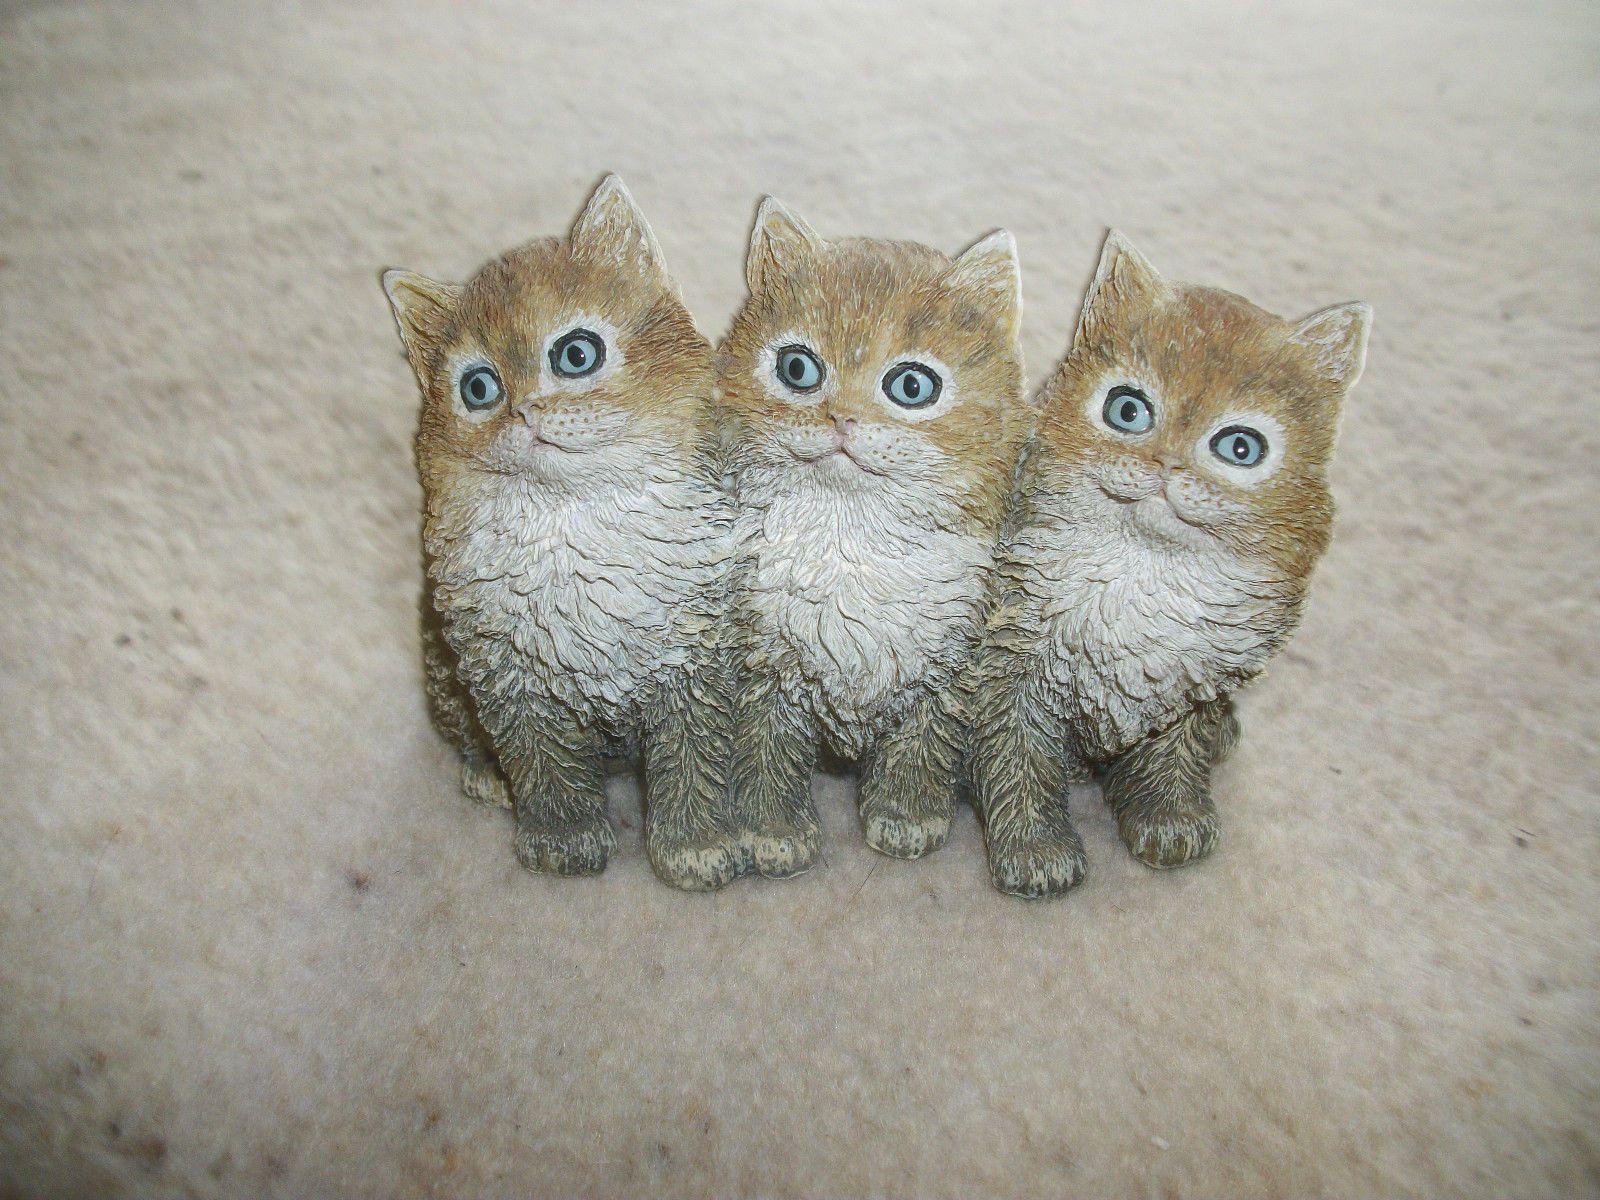 Just Adorable Danbury Mint T Janner 97 Three Little Kittens Resin Cat Ornament | eBay